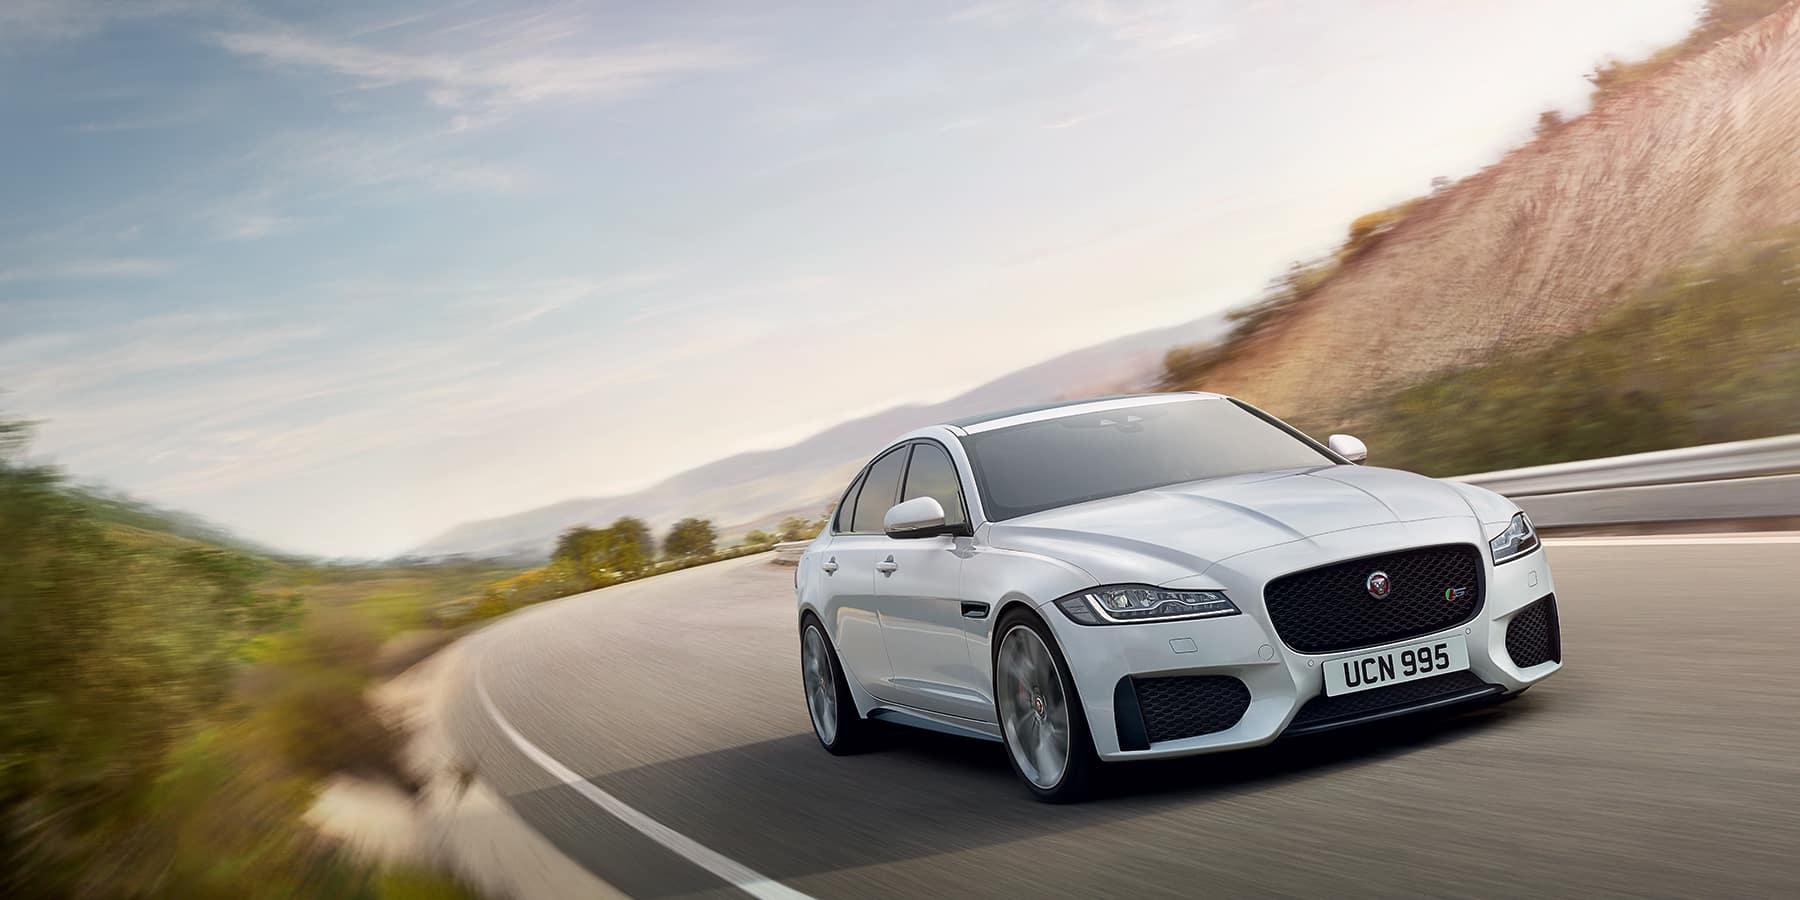 Jaguar XF white exterior